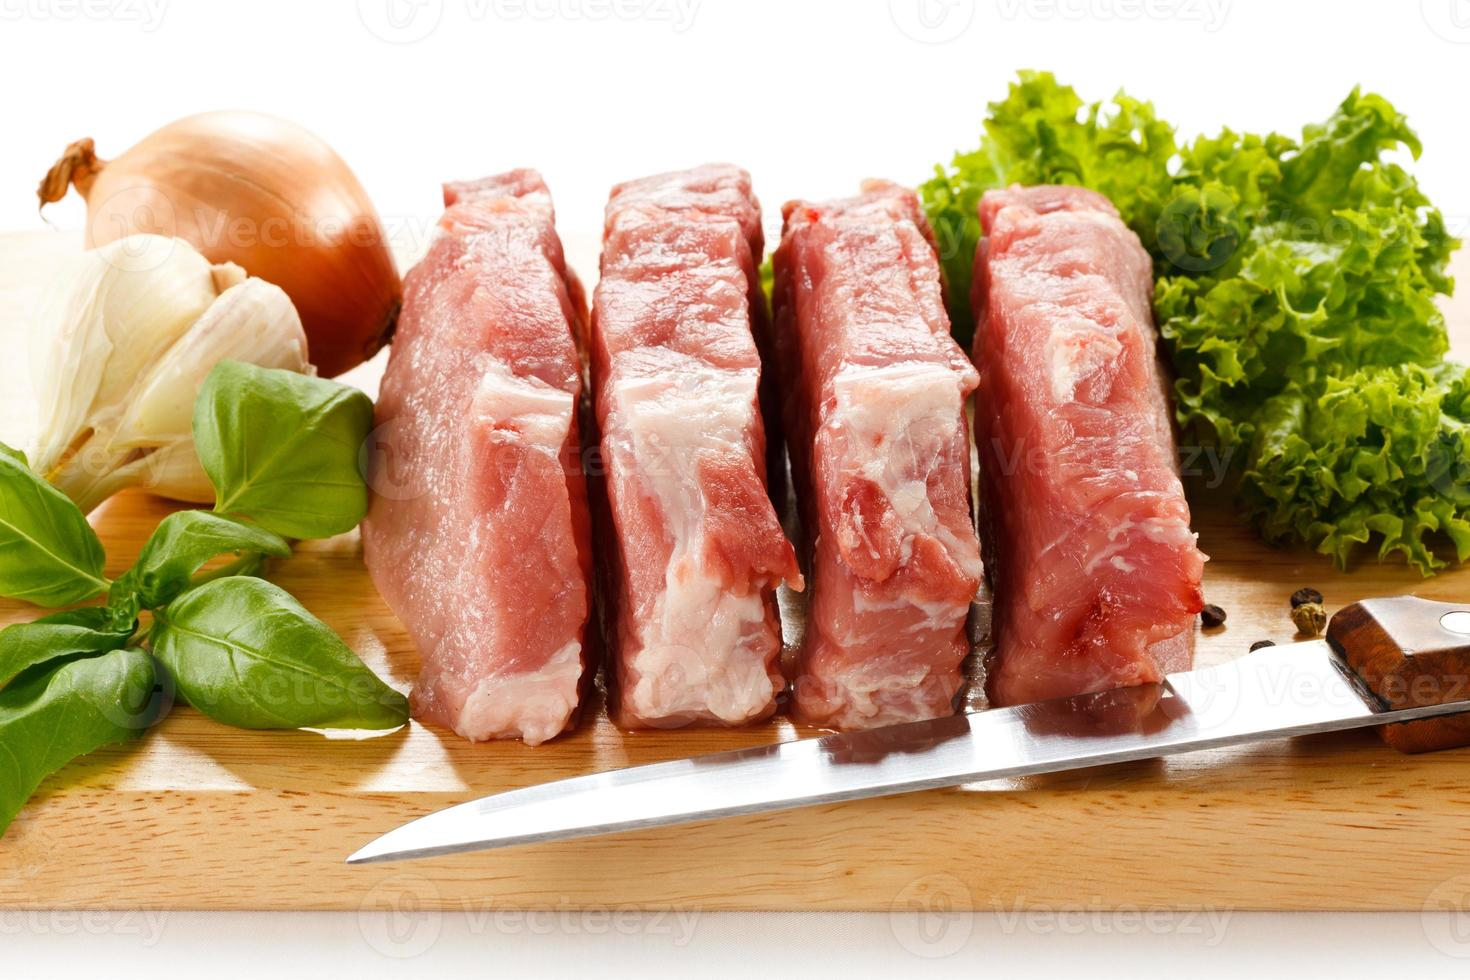 carne de porco crua fresca na tábua foto